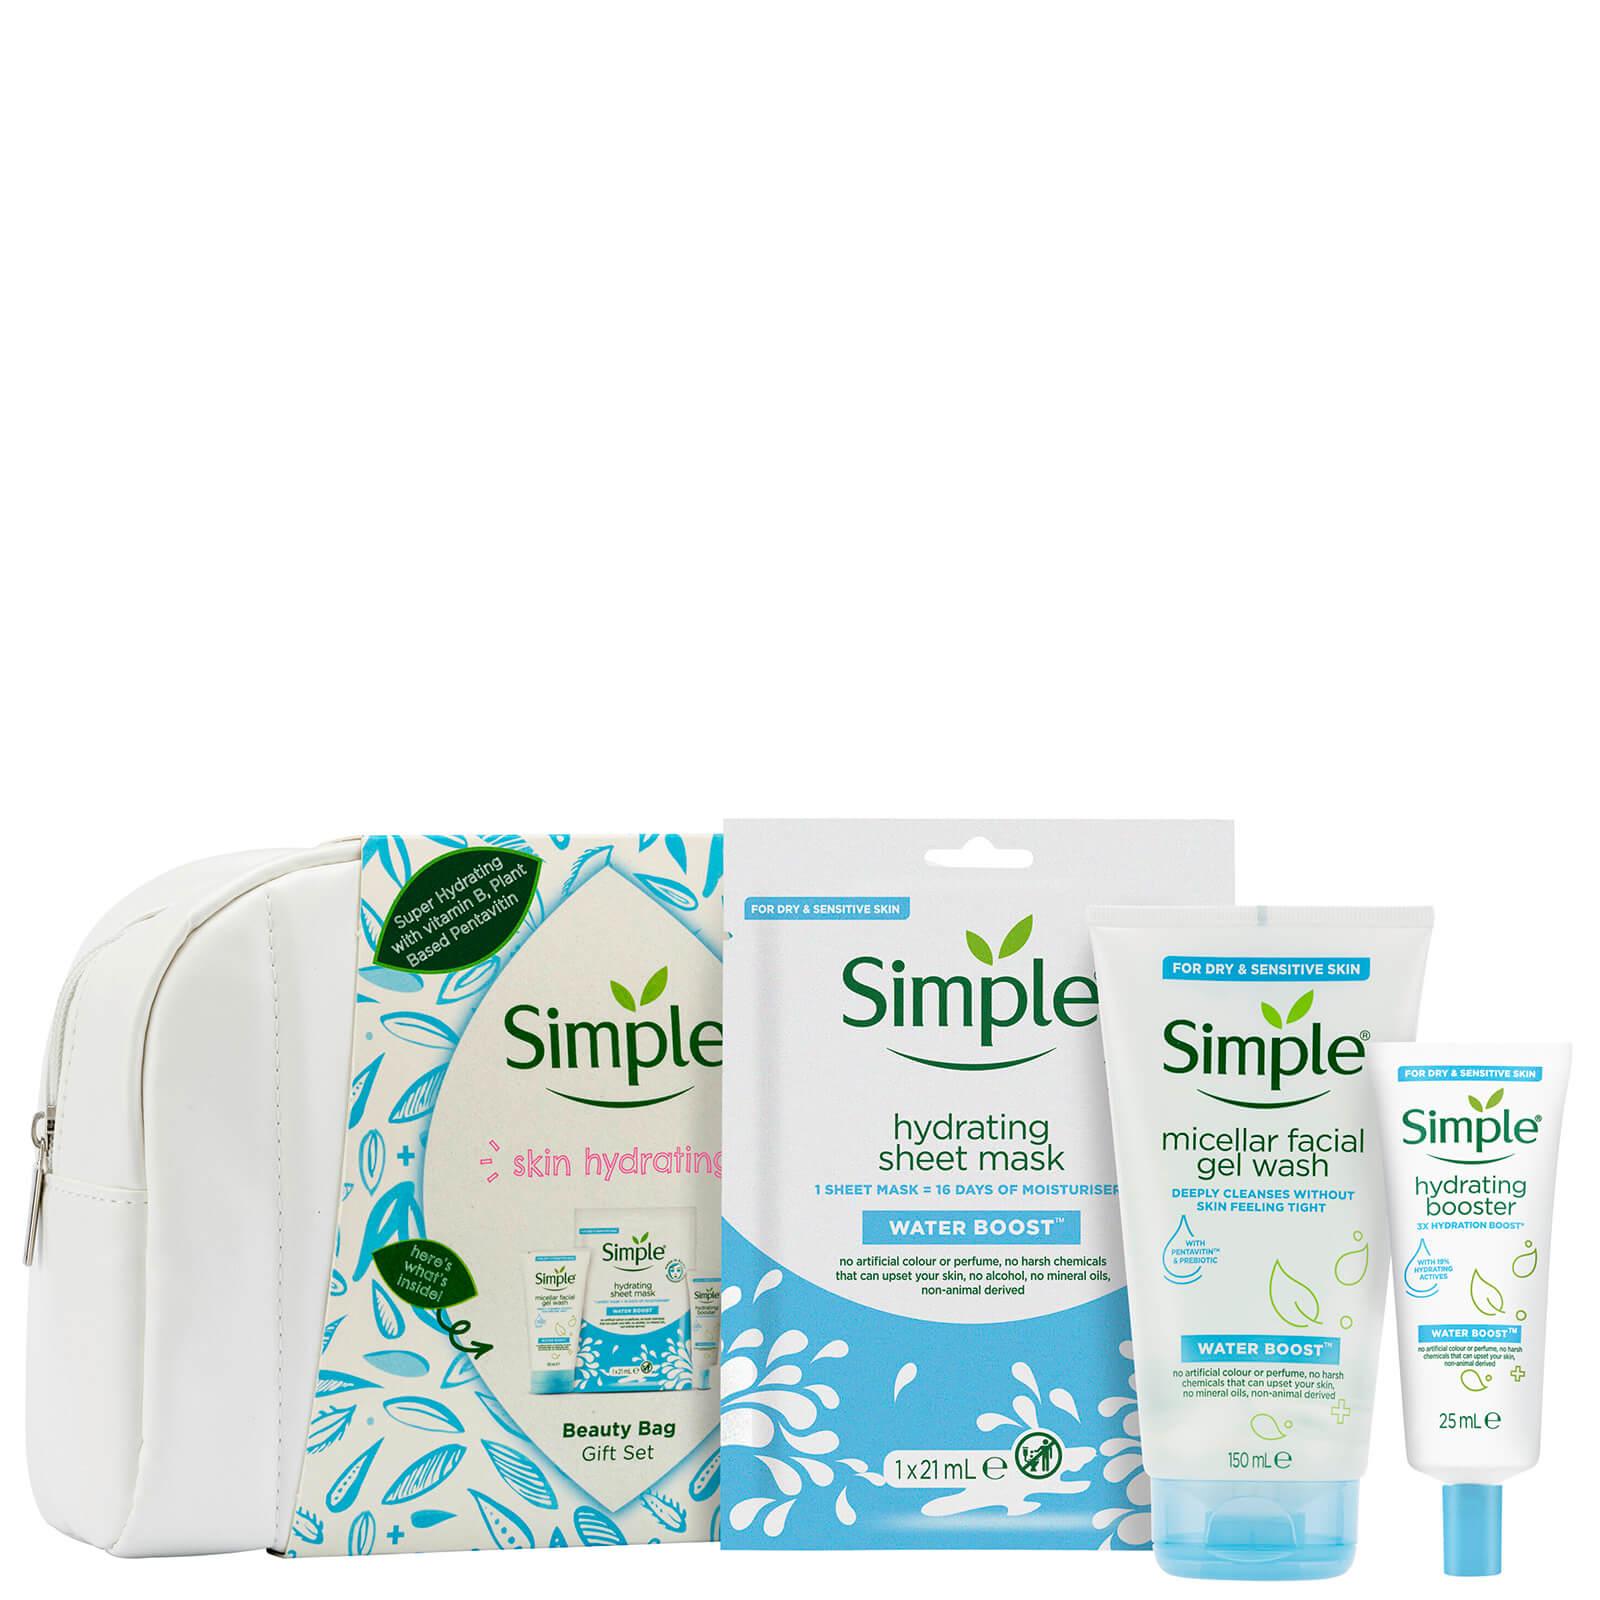 Купить Подарочный набор Simple Skin Hydrating Beauty Bag GiftSet